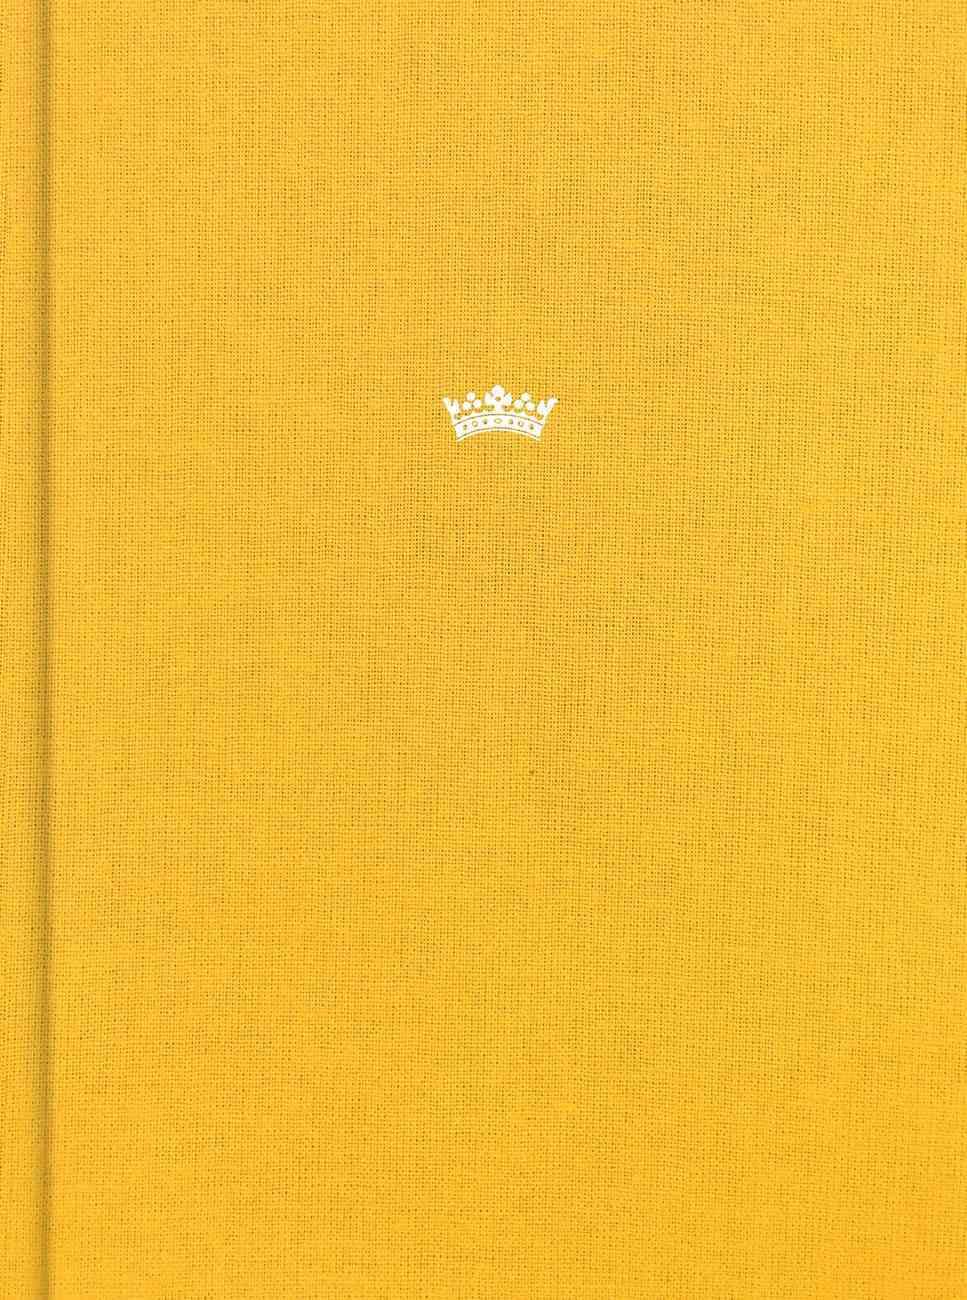 CSB Tony Evans Study Bible Goldenrod Indexed (Black Letter Edition) Fabric Over Hardback